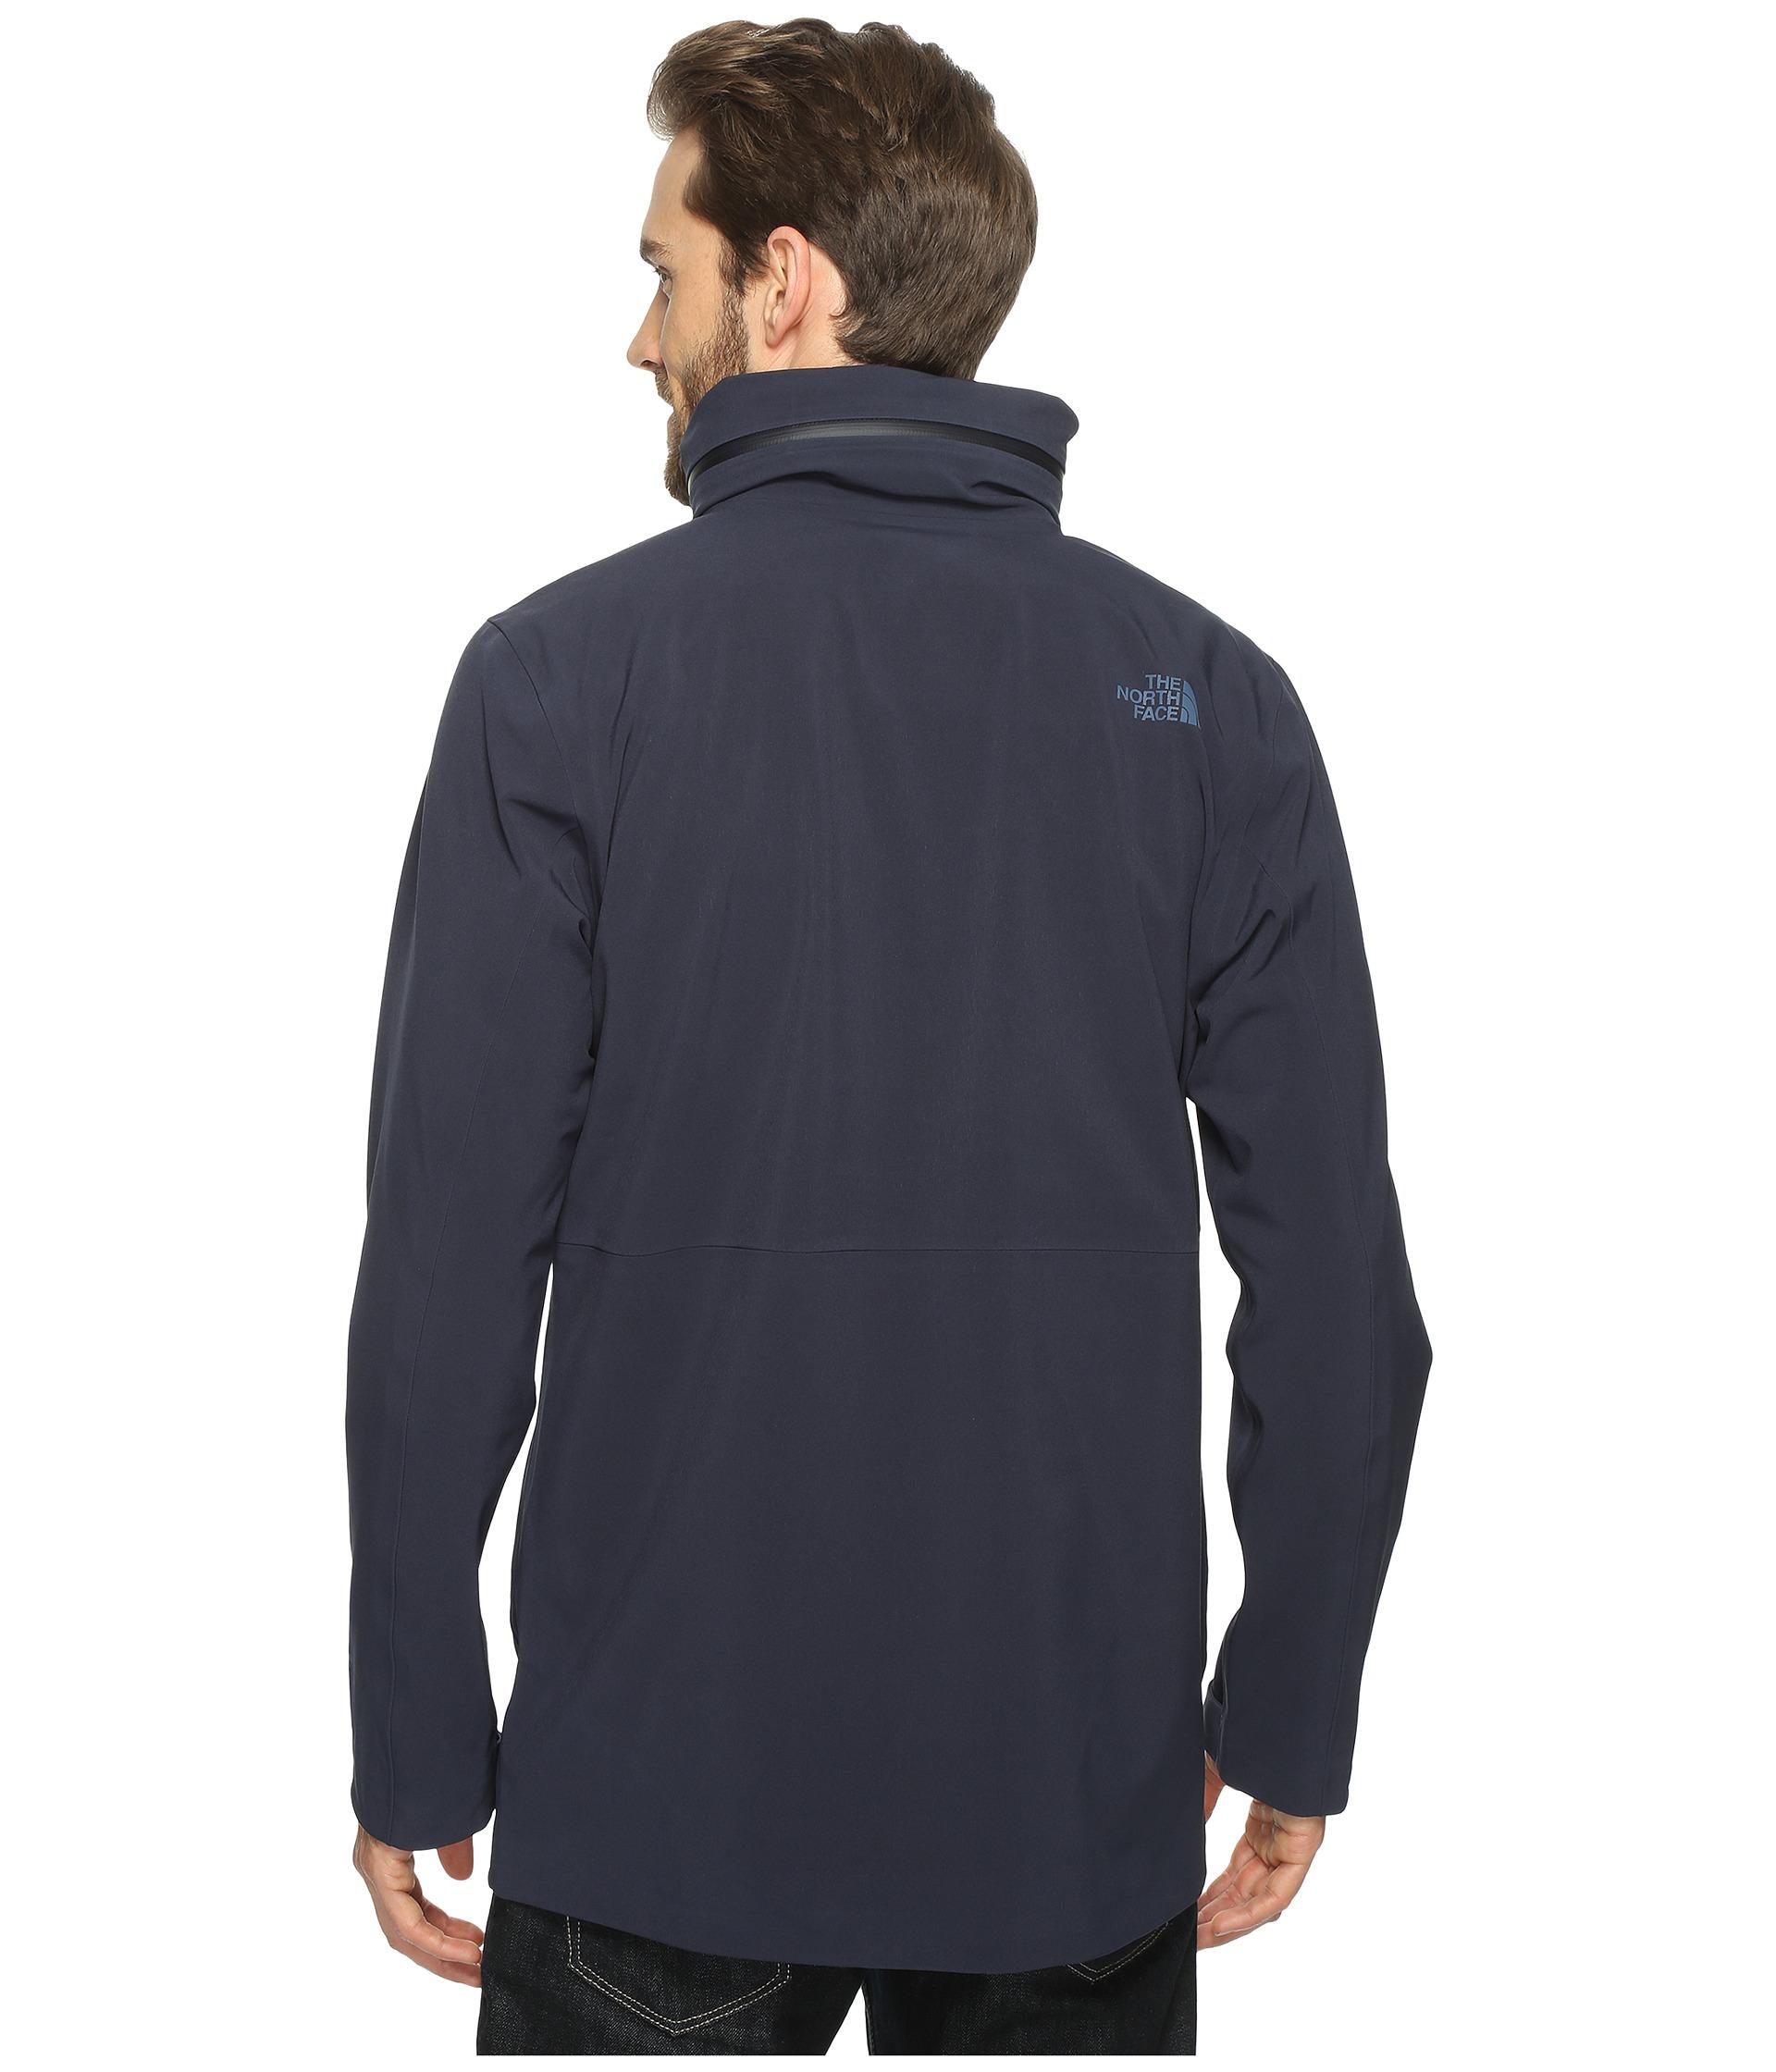 north face gore tex jacket with fleece collar